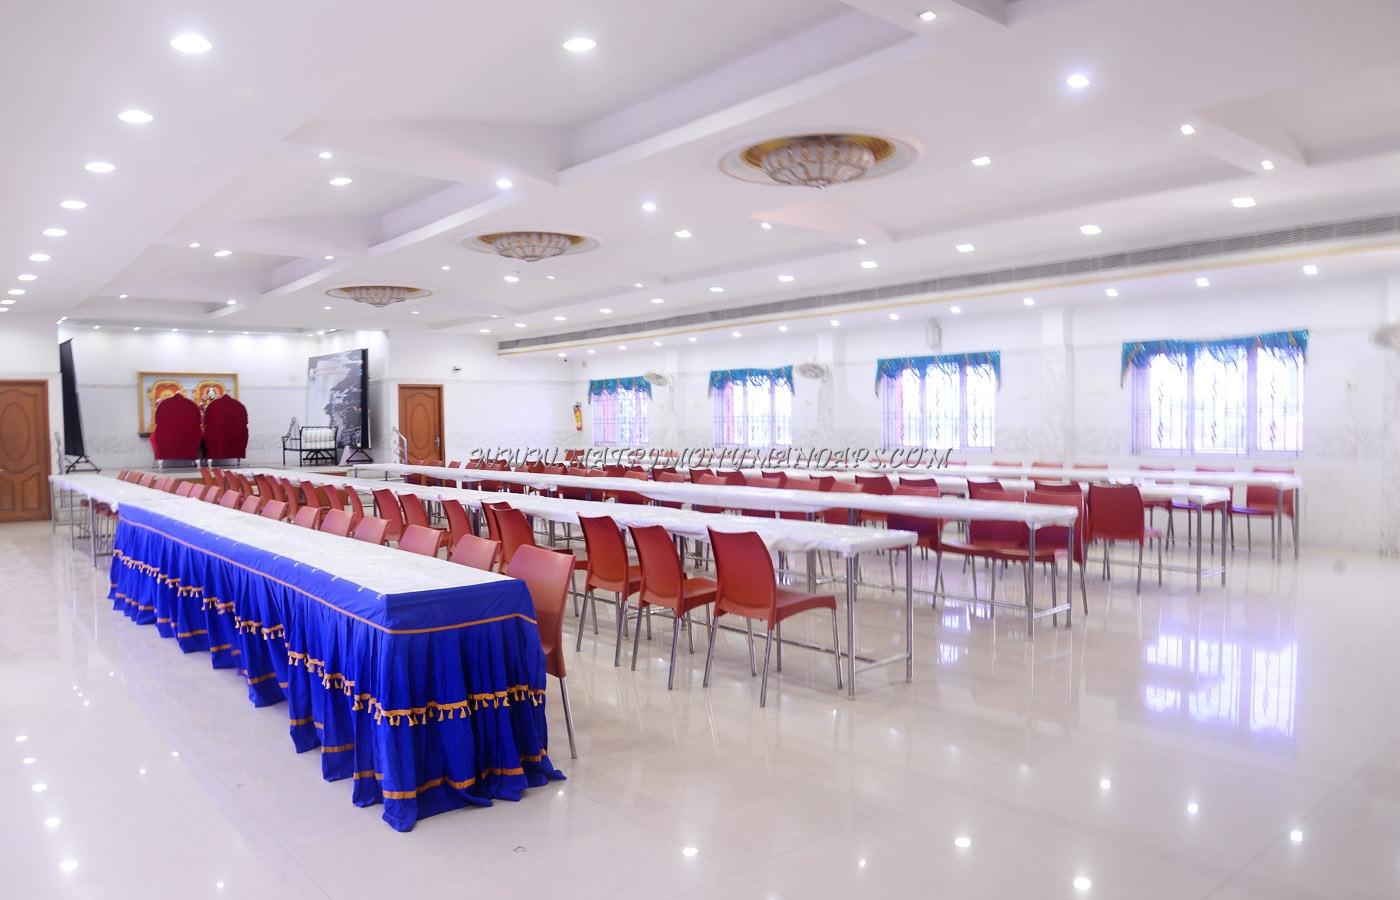 JS Malini Mahal - Dining Hall